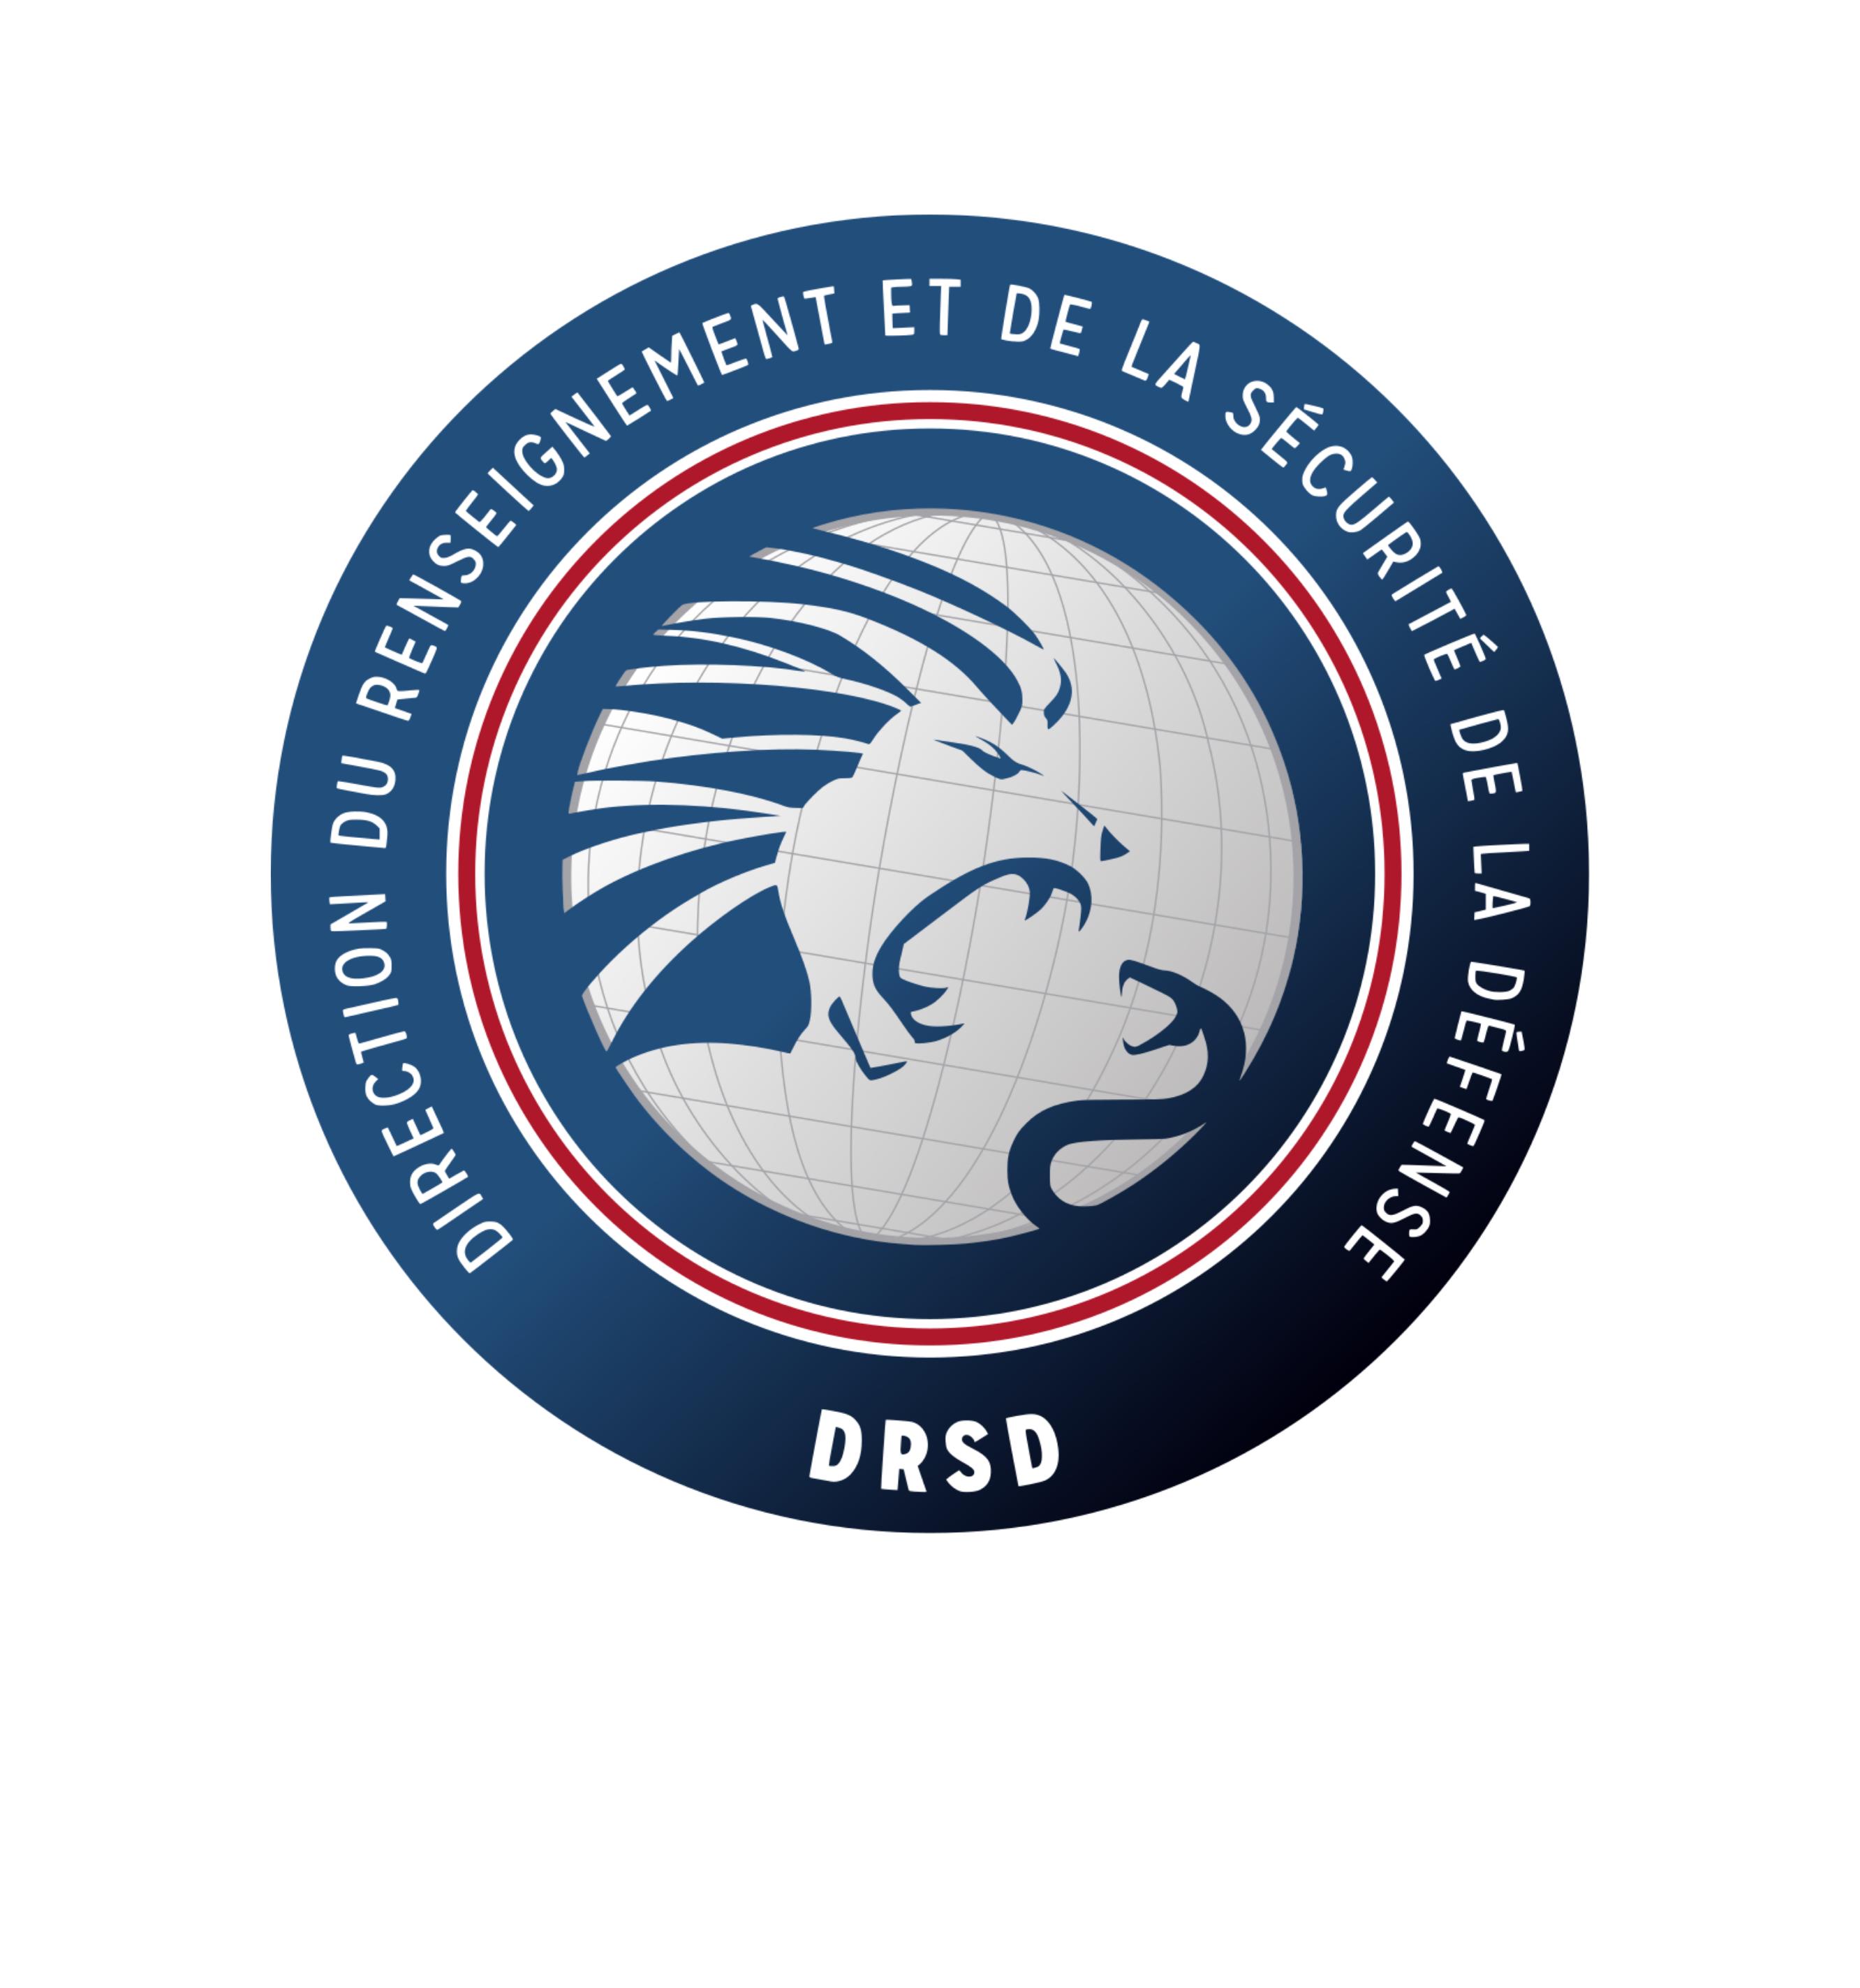 iremos-logiciel-thom-as-rdi+-direction-renseignement-securite-defense-drsd (2)